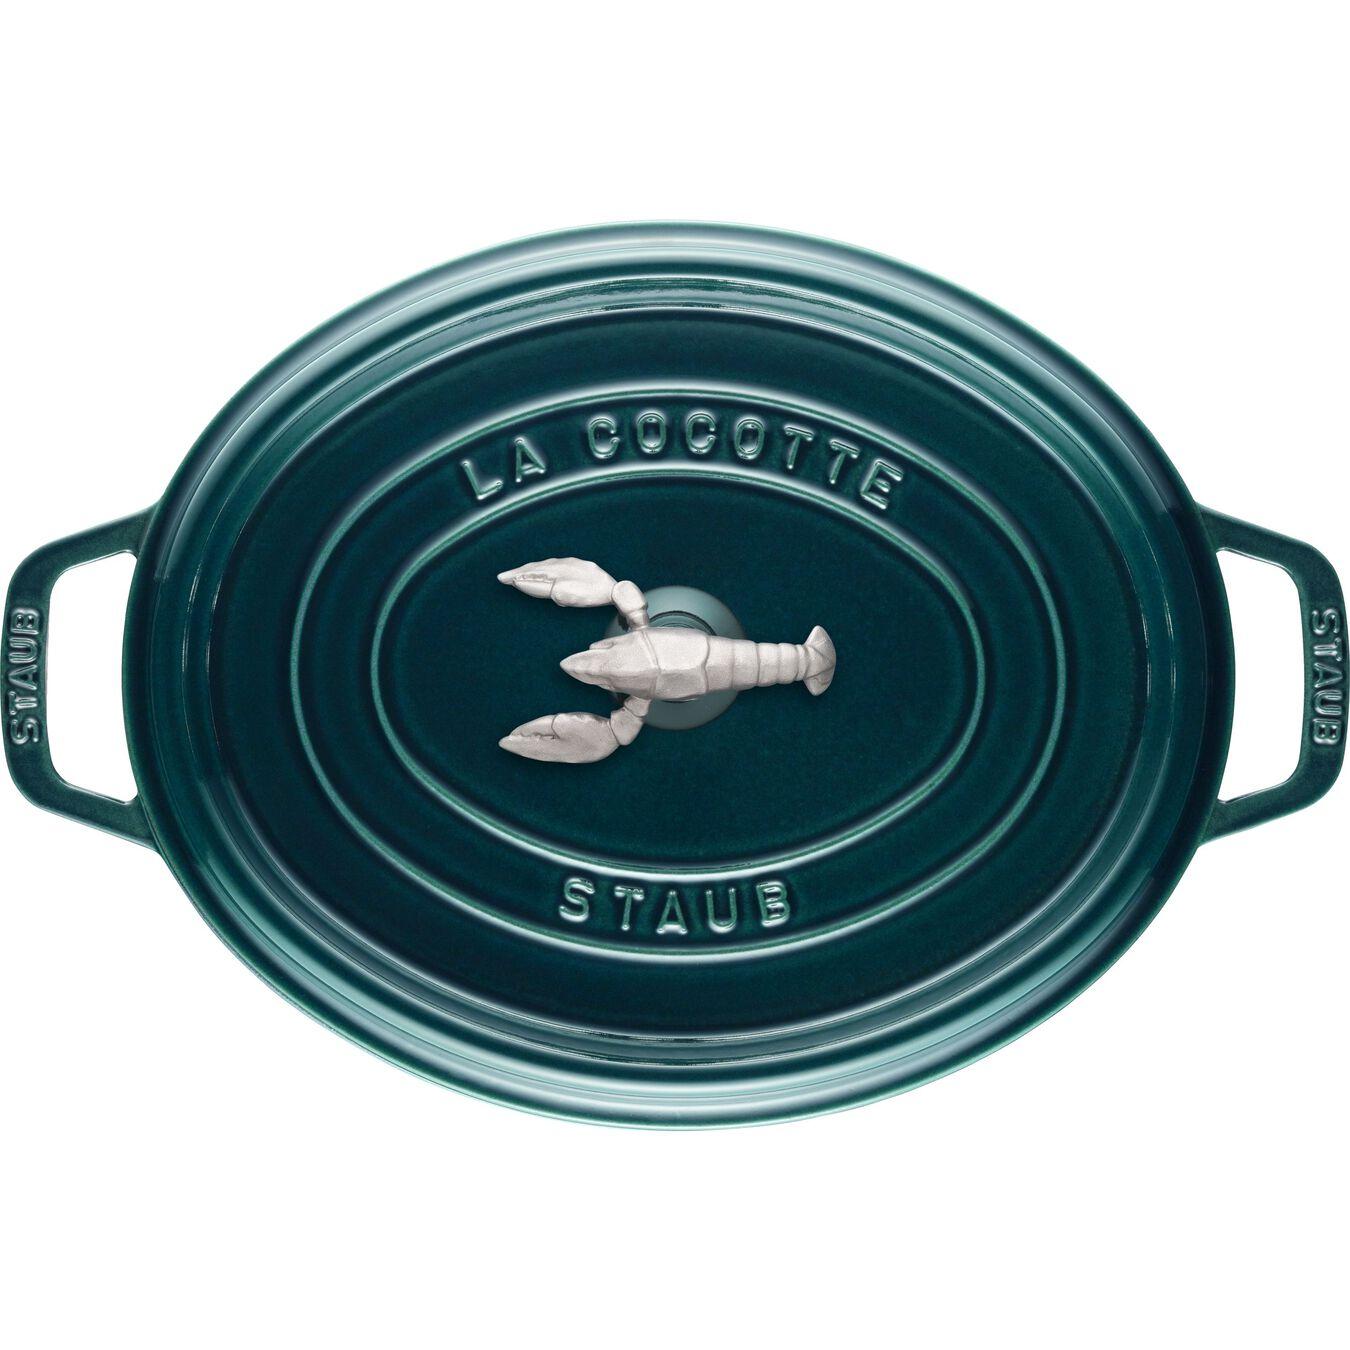 Cocotte bouton homard 31 cm, Ovale, Blue La-Mer, Fonte,,large 3